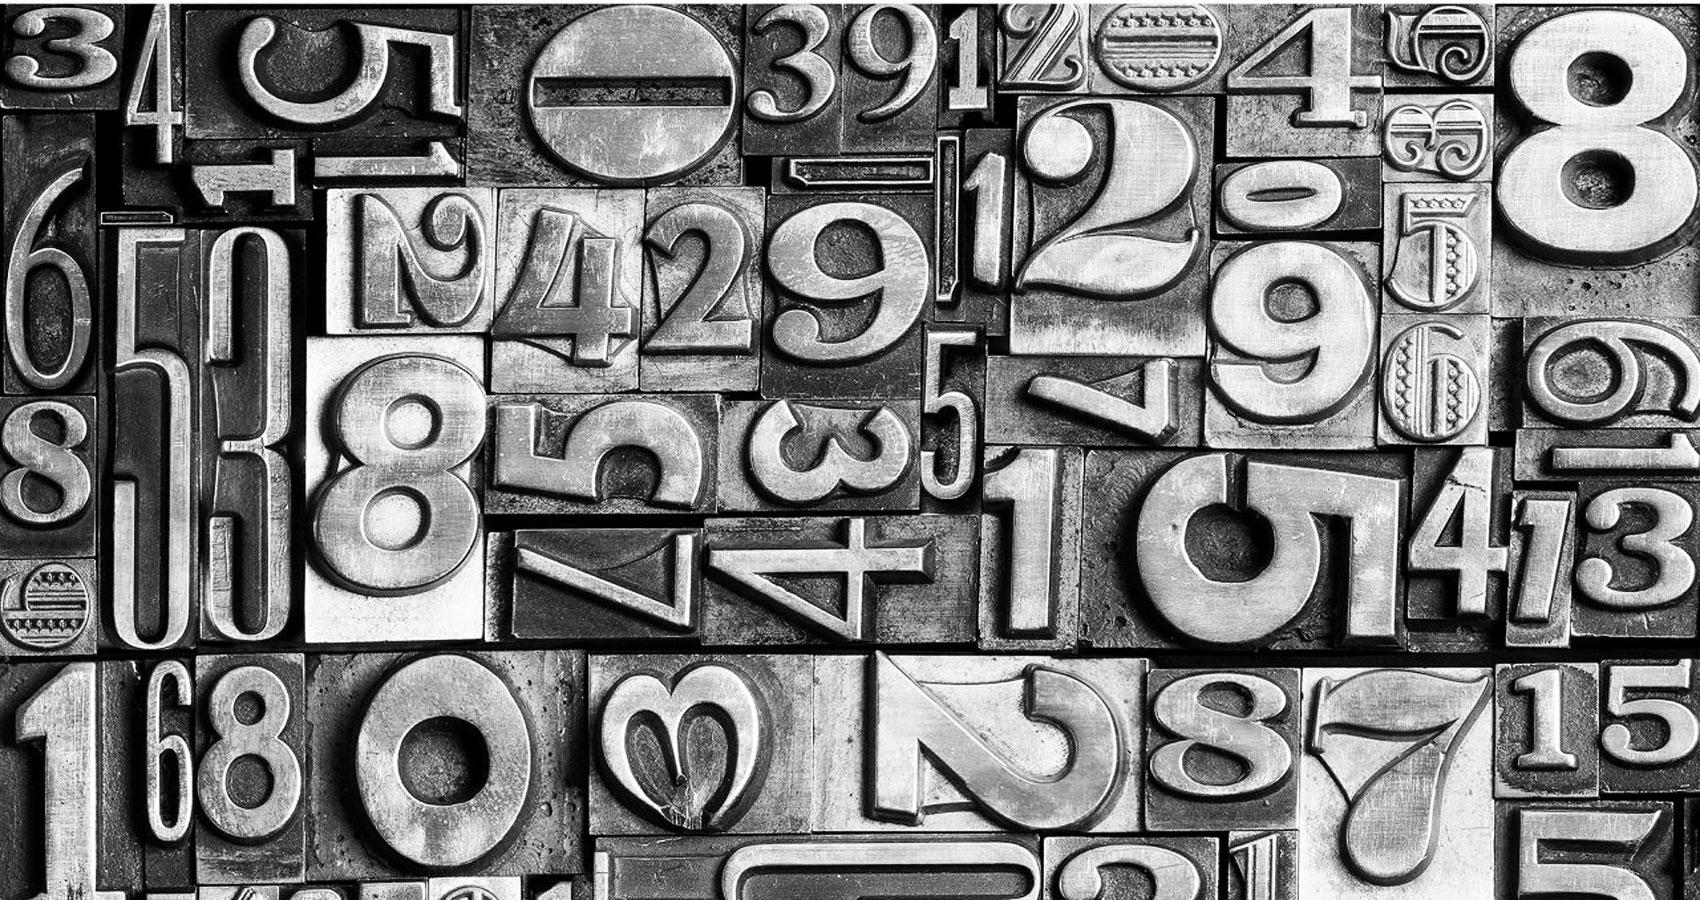 Numeros by José A. Gómez at Spillwords.com